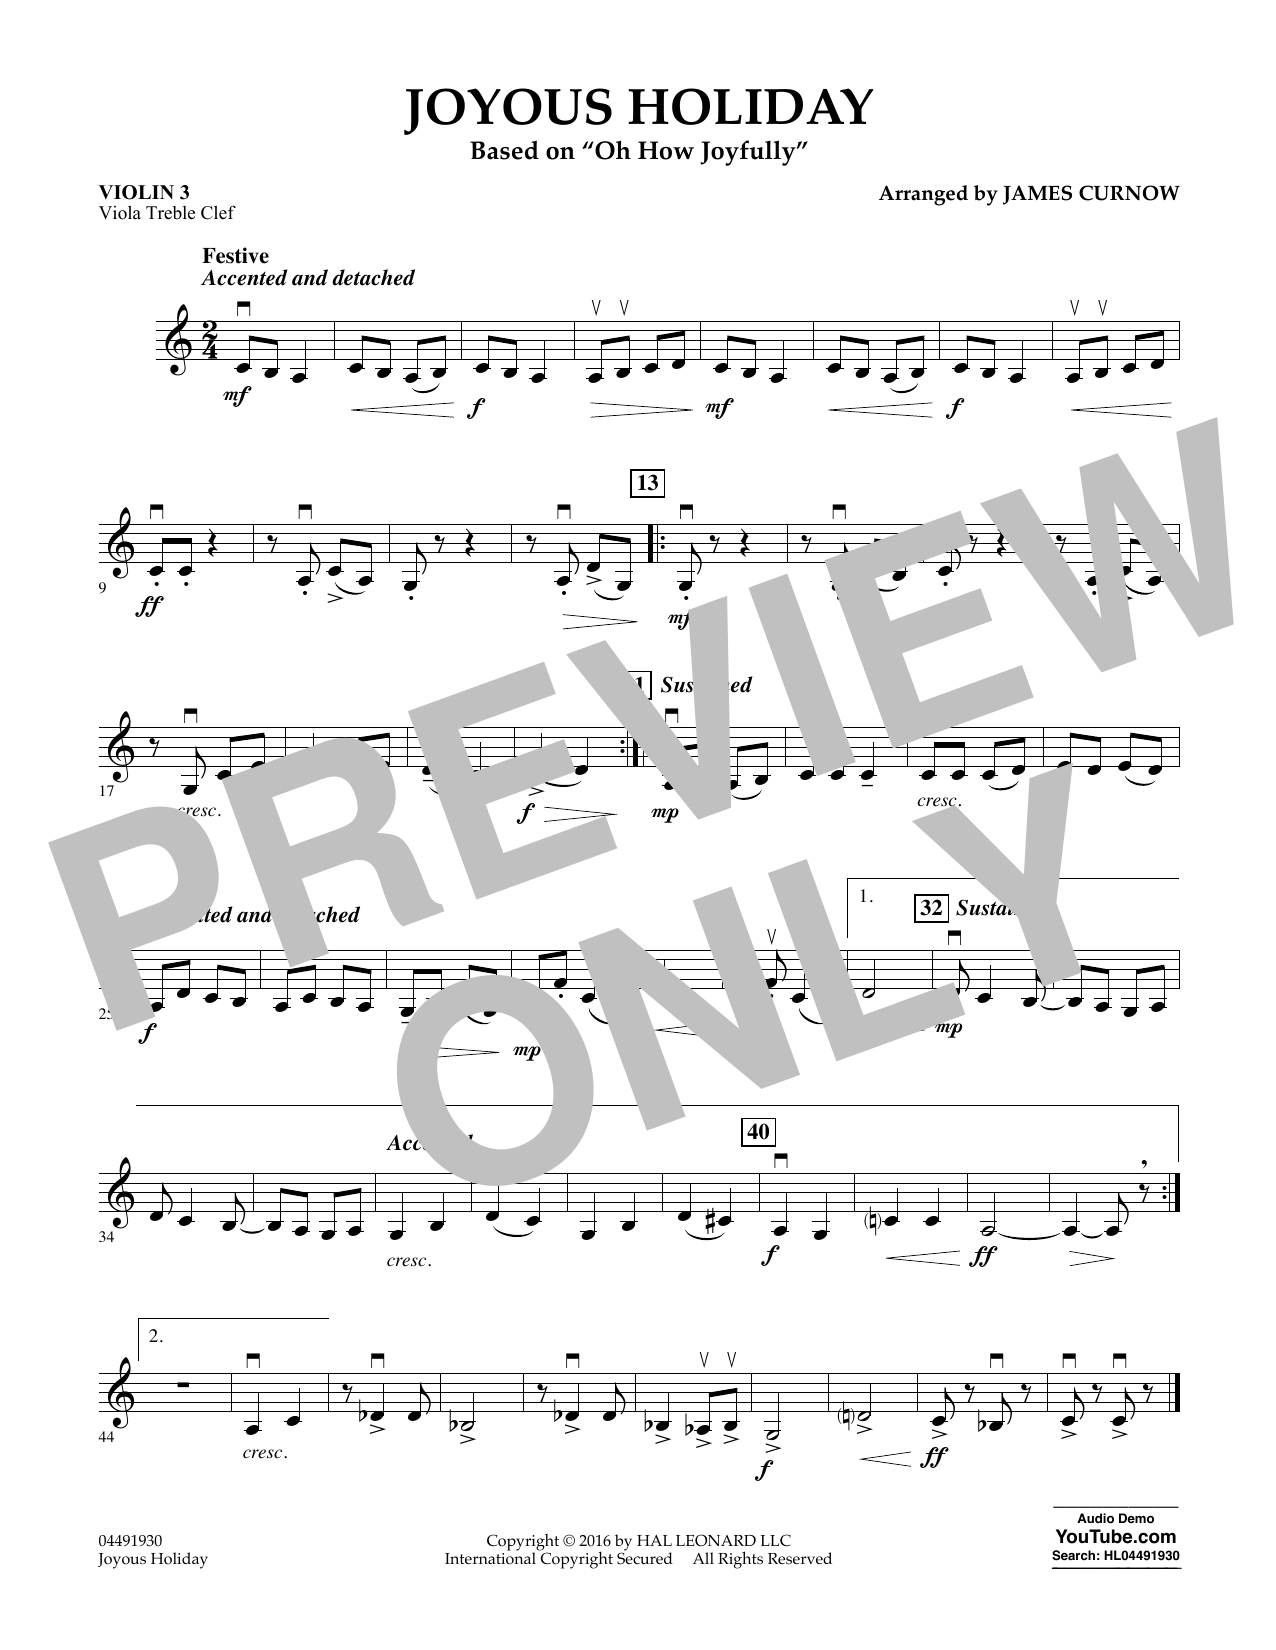 Joyous Holiday (based on Oh How Joyfully) - Violin 3 (Viola Treble Clef) Sheet Music